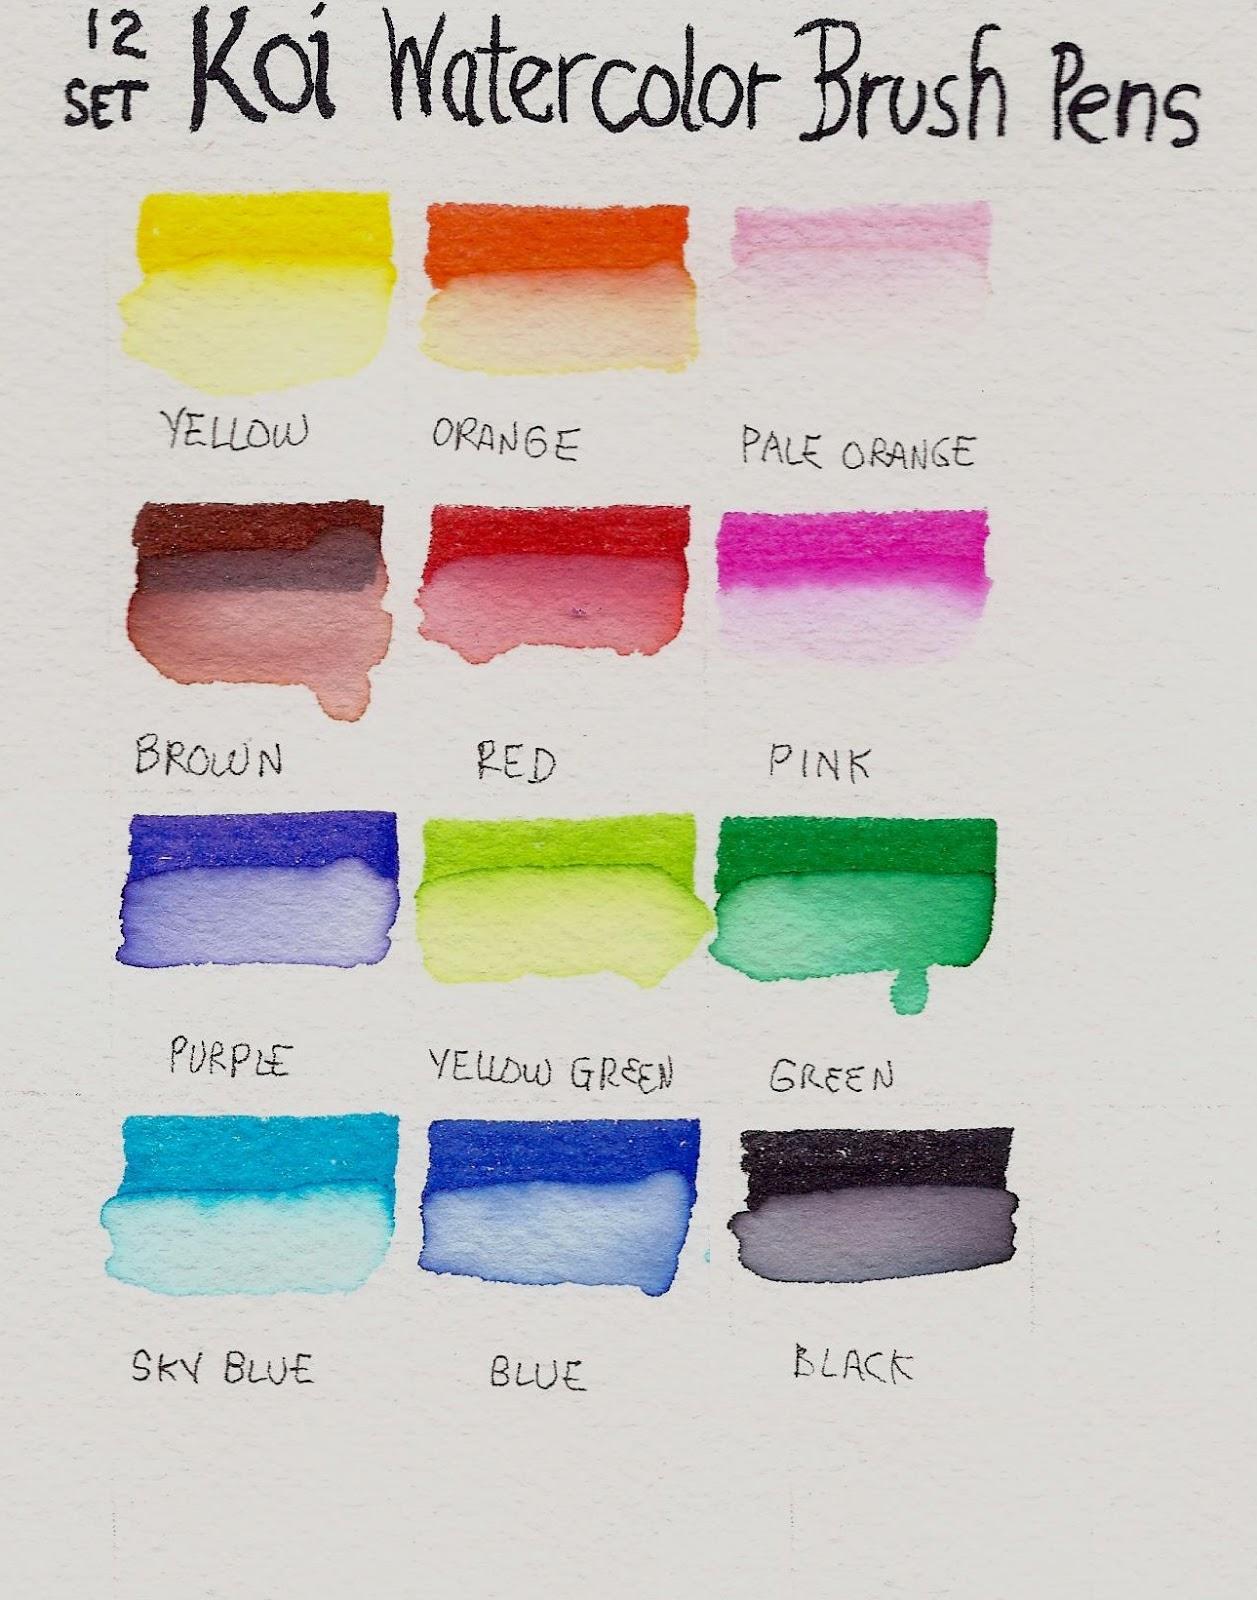 SAKURA Koi Colouring Brush Pen